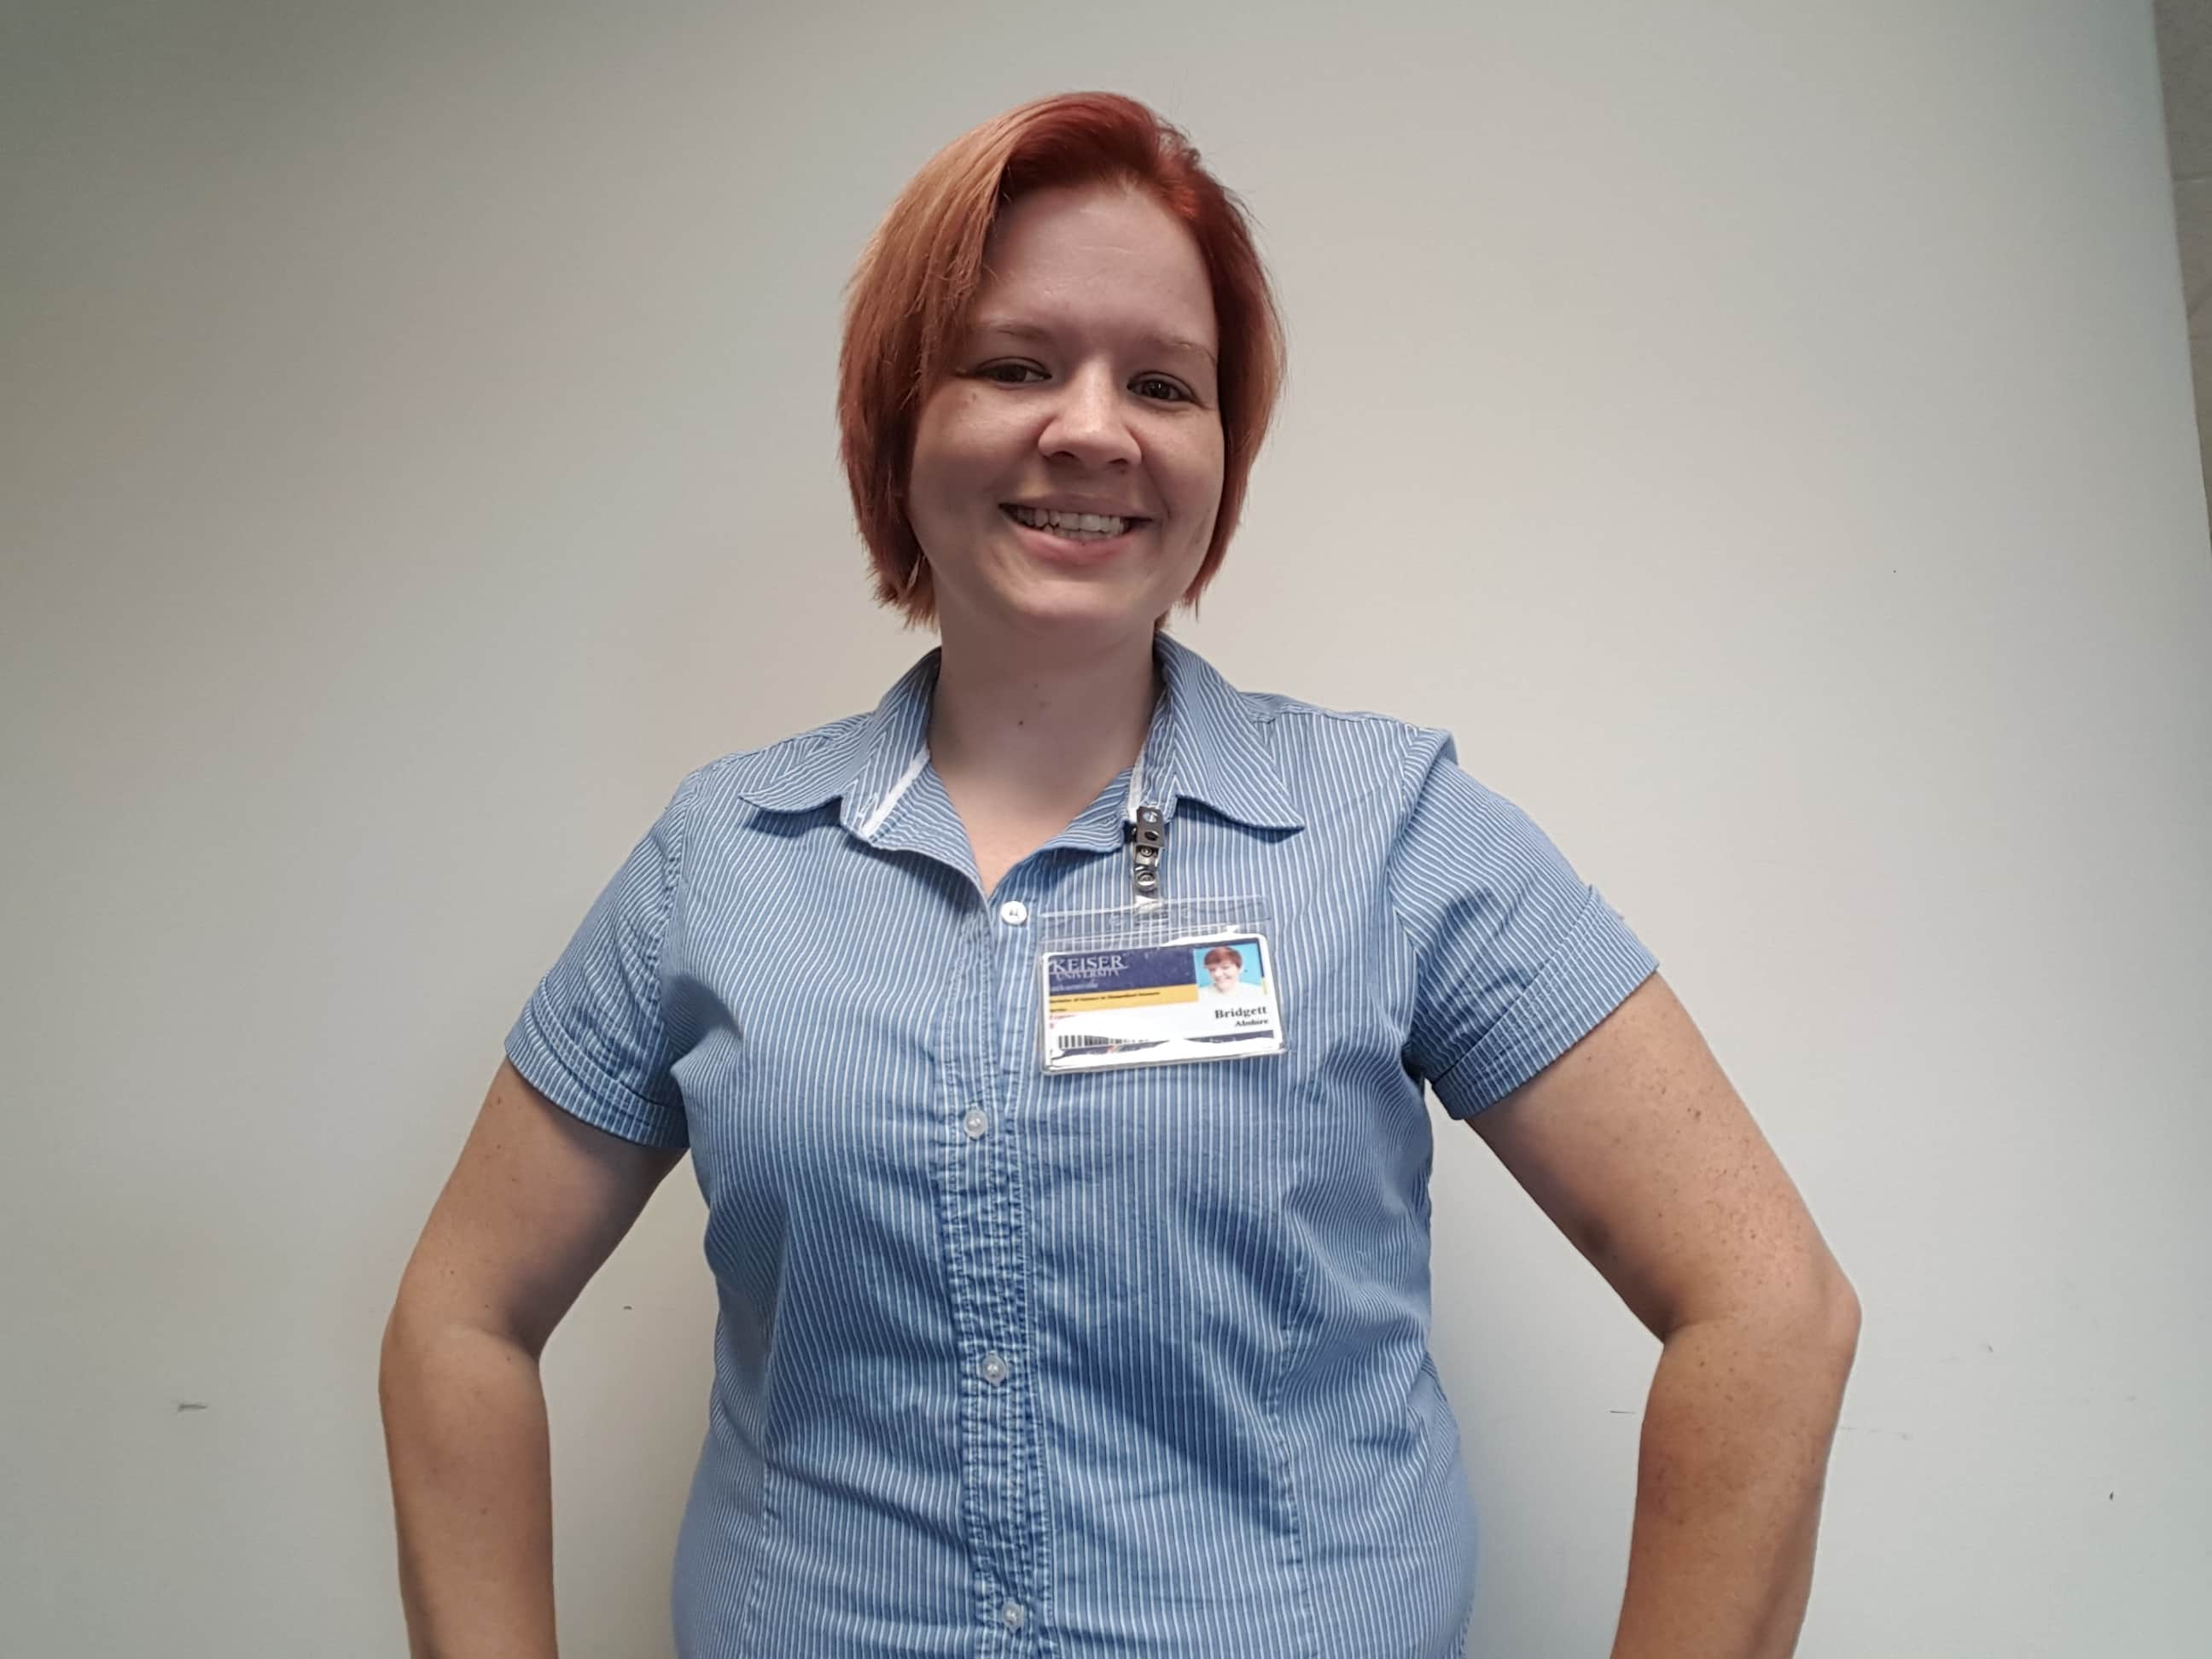 STUDENT SPOTLIGHT: Bridgett Abshire, KU Jacksonville, SGA President